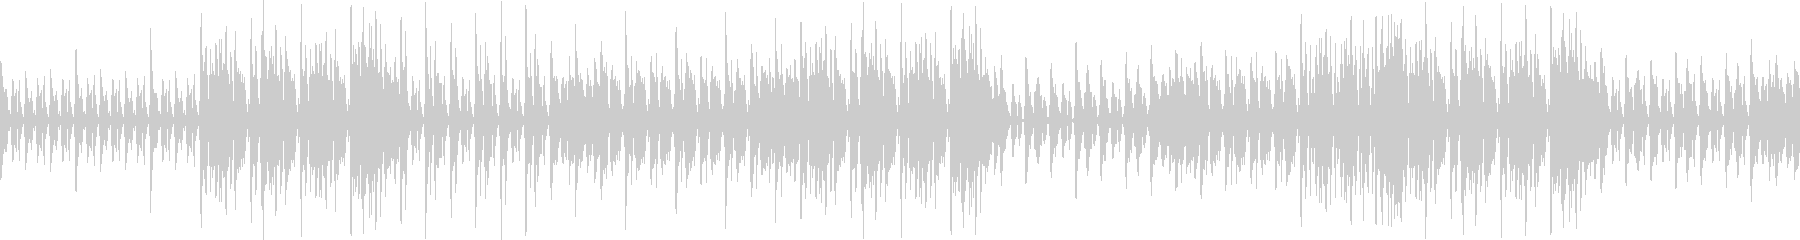 FUNK JAZZ track's unreproduced waveform